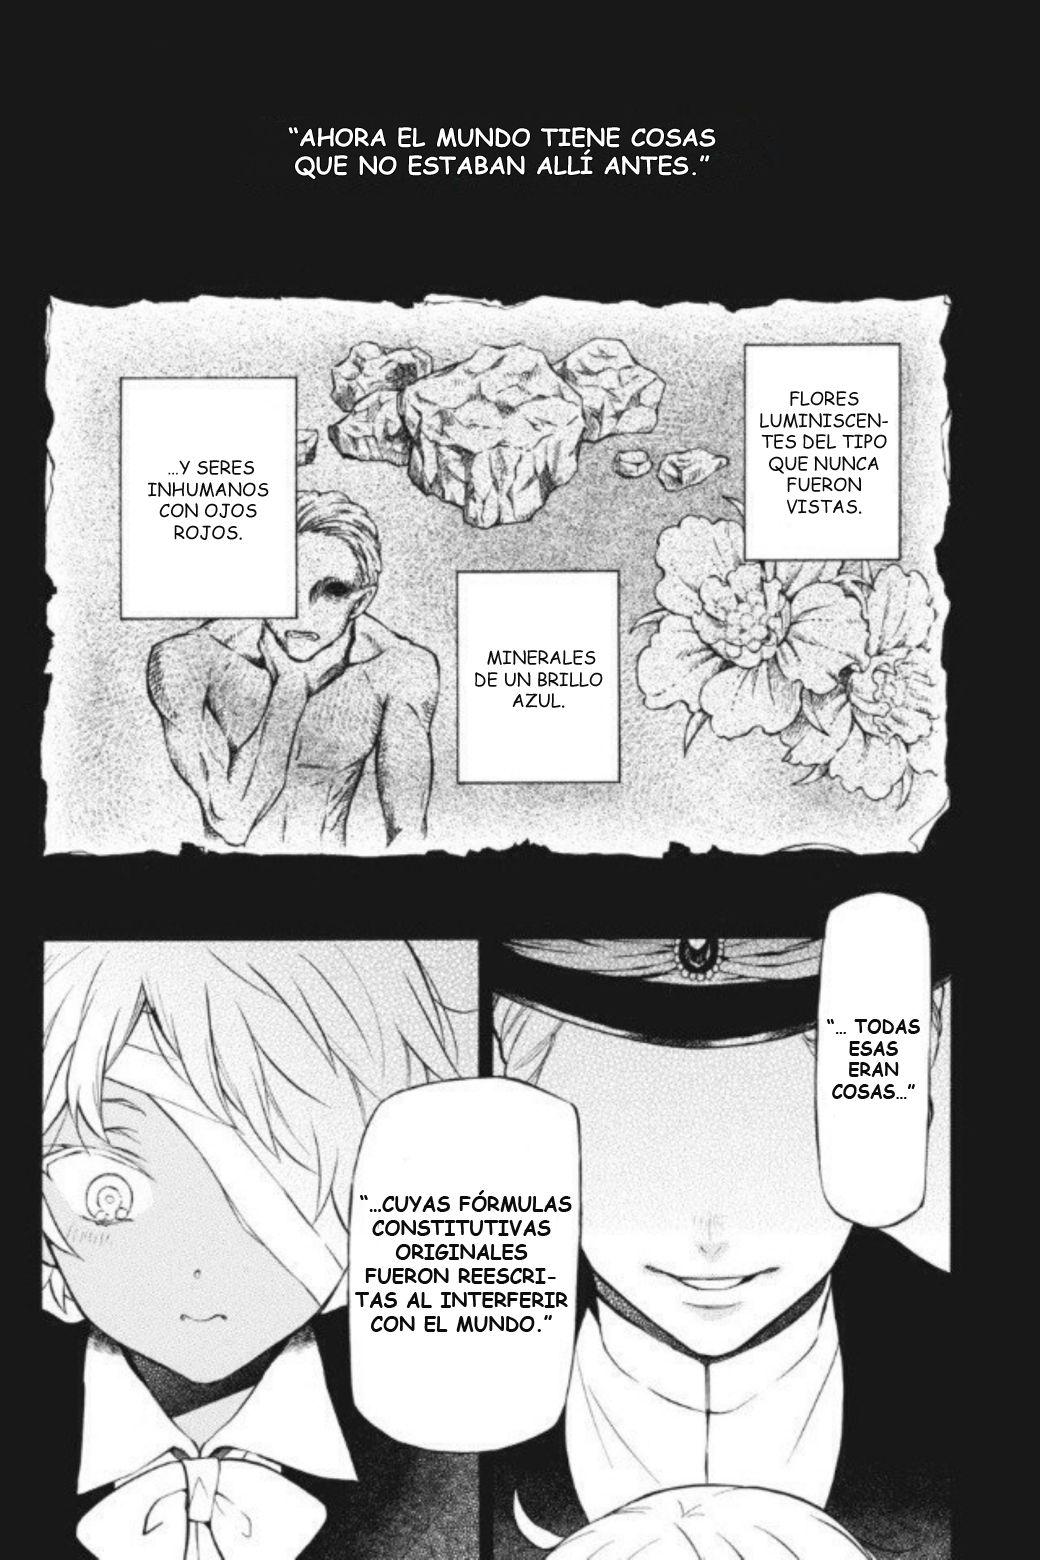 https://c5.ninemanga.com/es_manga/48/18672/478200/f60f472142710c6ee88c70a62e1f8ef2.jpg Page 5